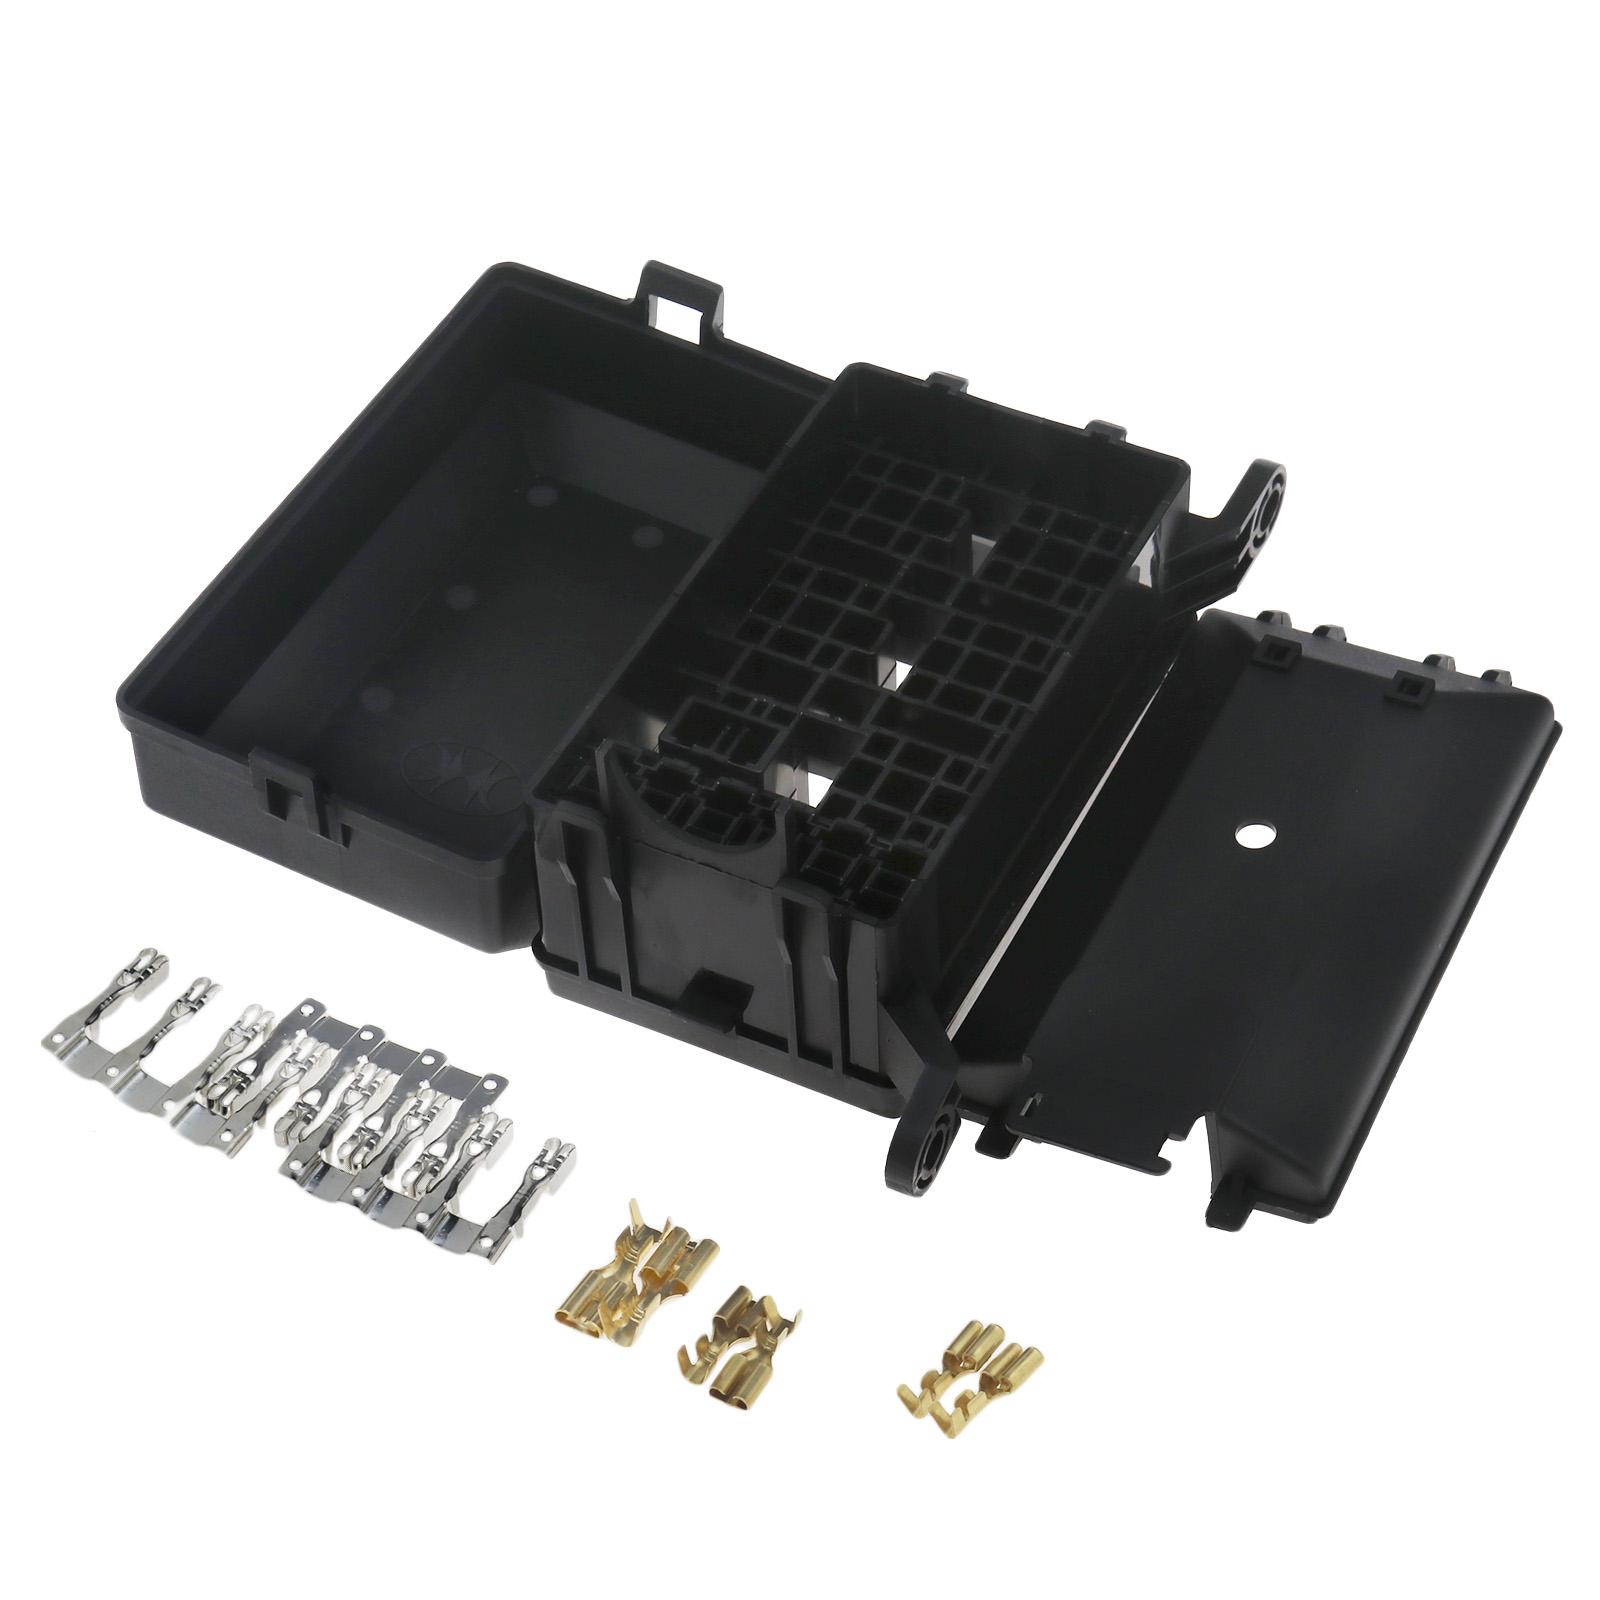 tn 12v fuse box auto 6 relay block holder 5 road for car trunk atv insurance